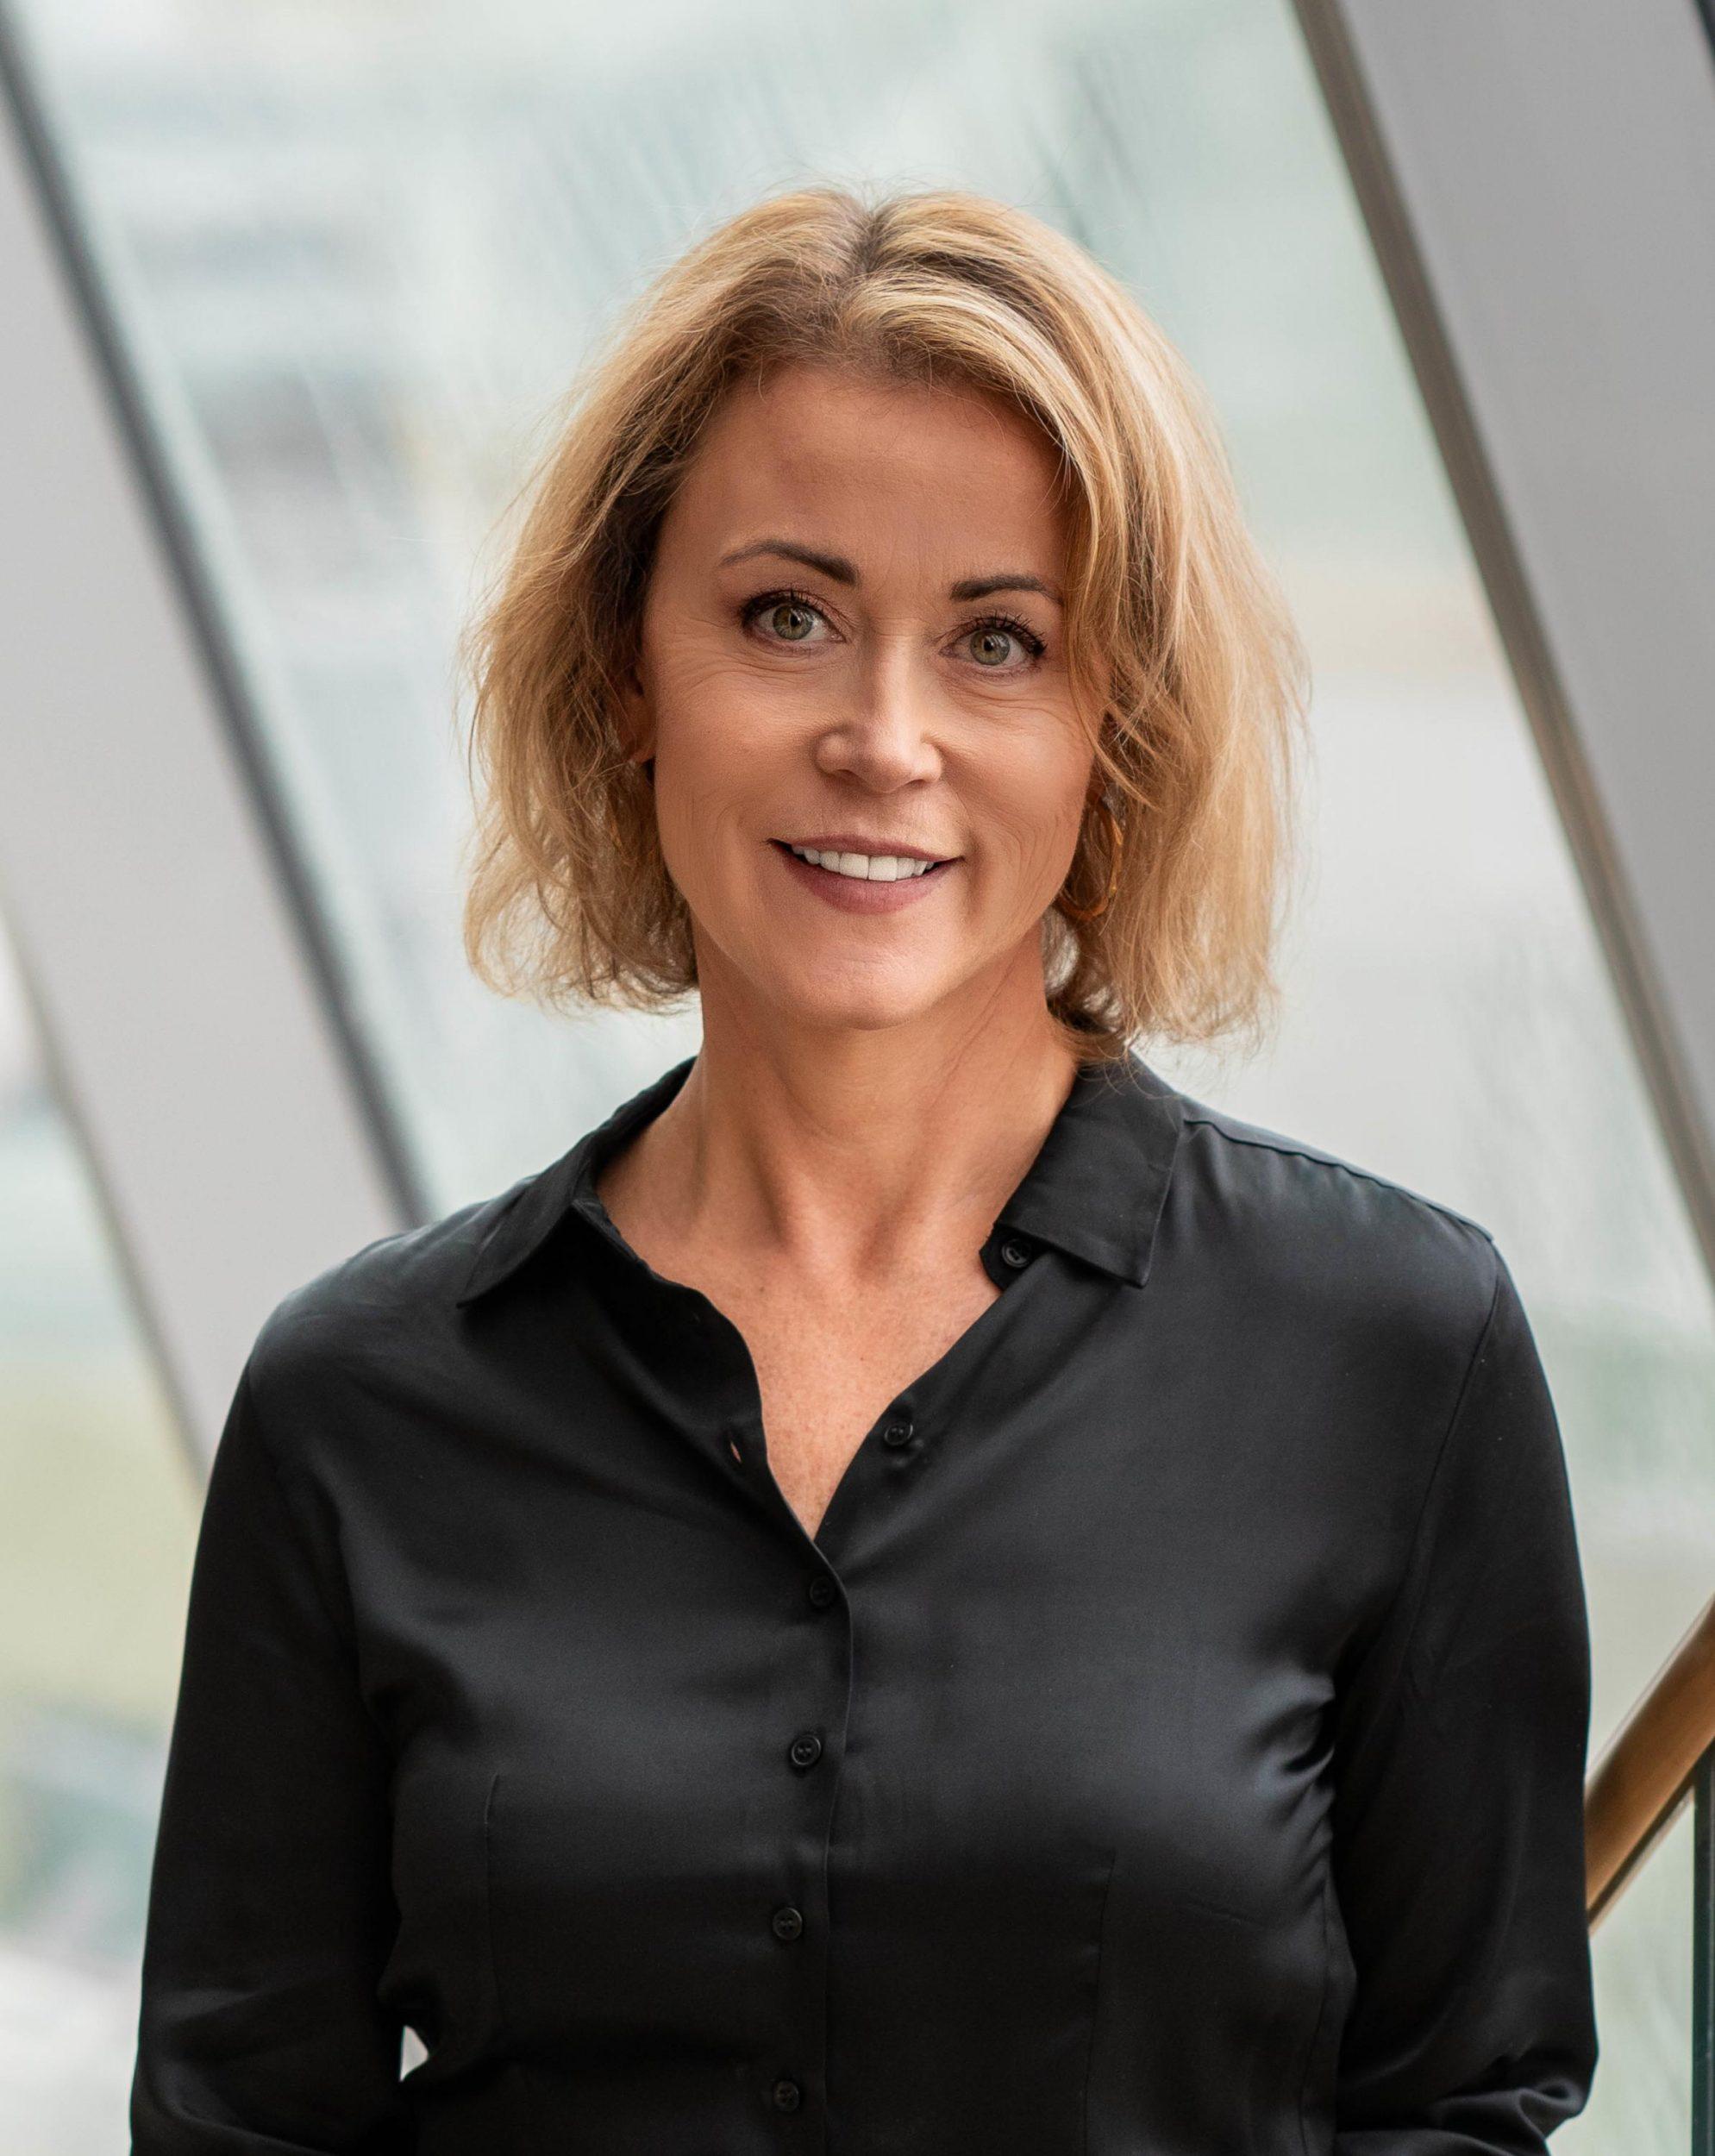 Karin Mendel